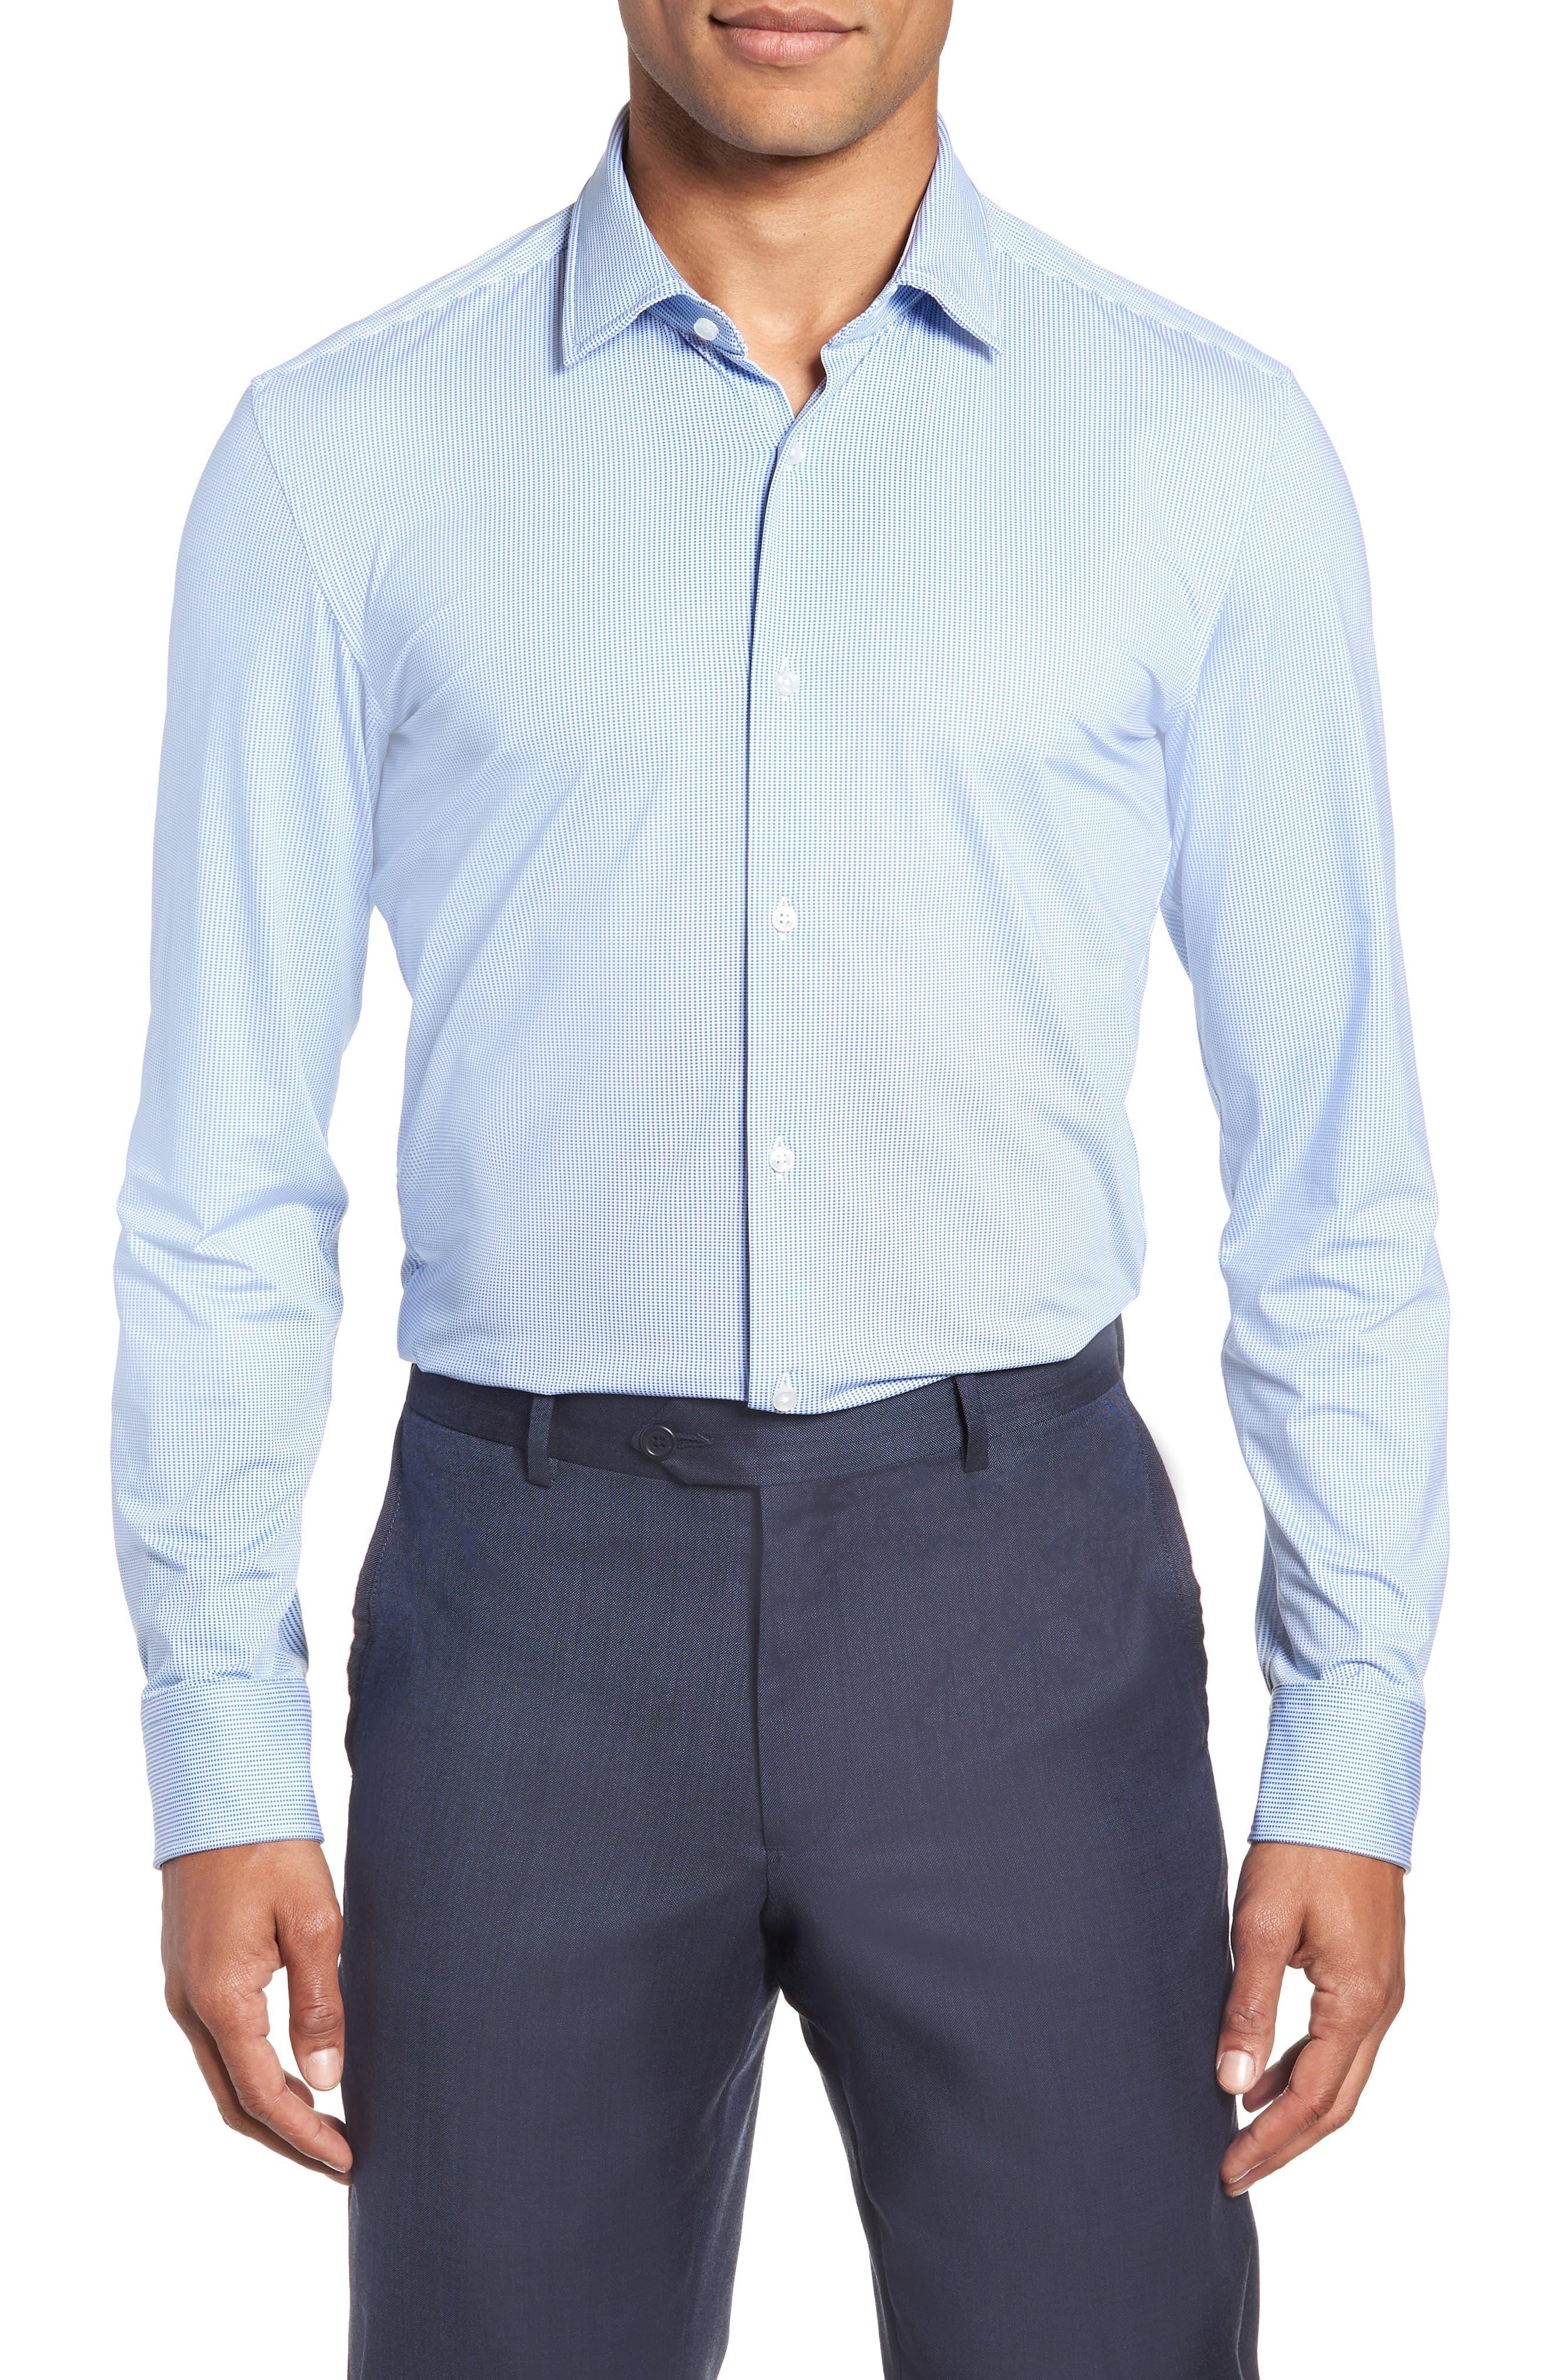 Jenno Slim Fit Stretch Check Dress Shirt,                             Main thumbnail 1, color,                             BLUE